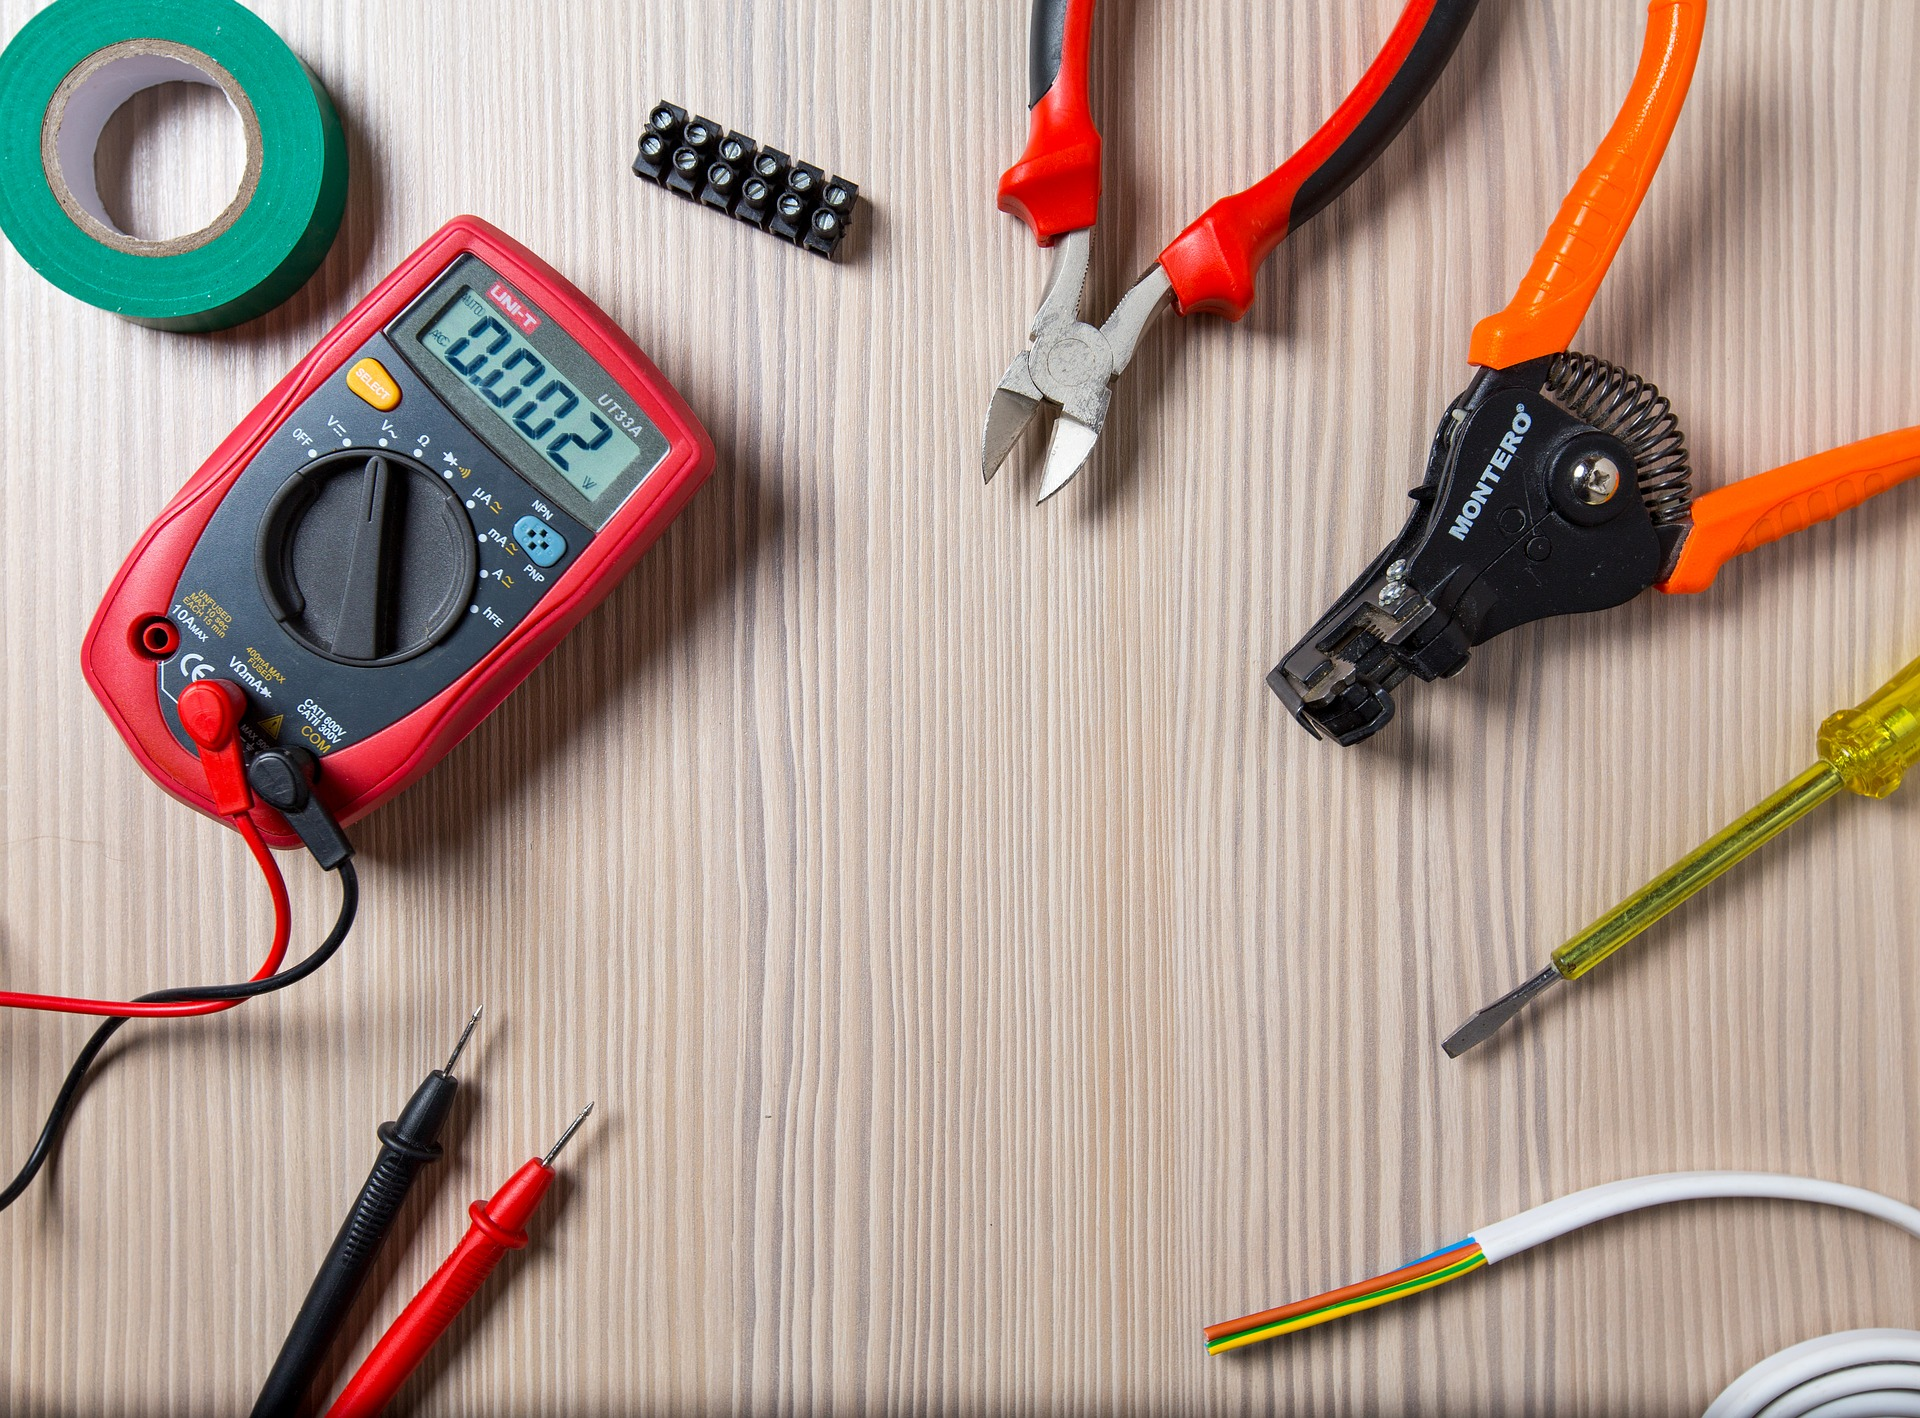 elektronik elektriker strøm